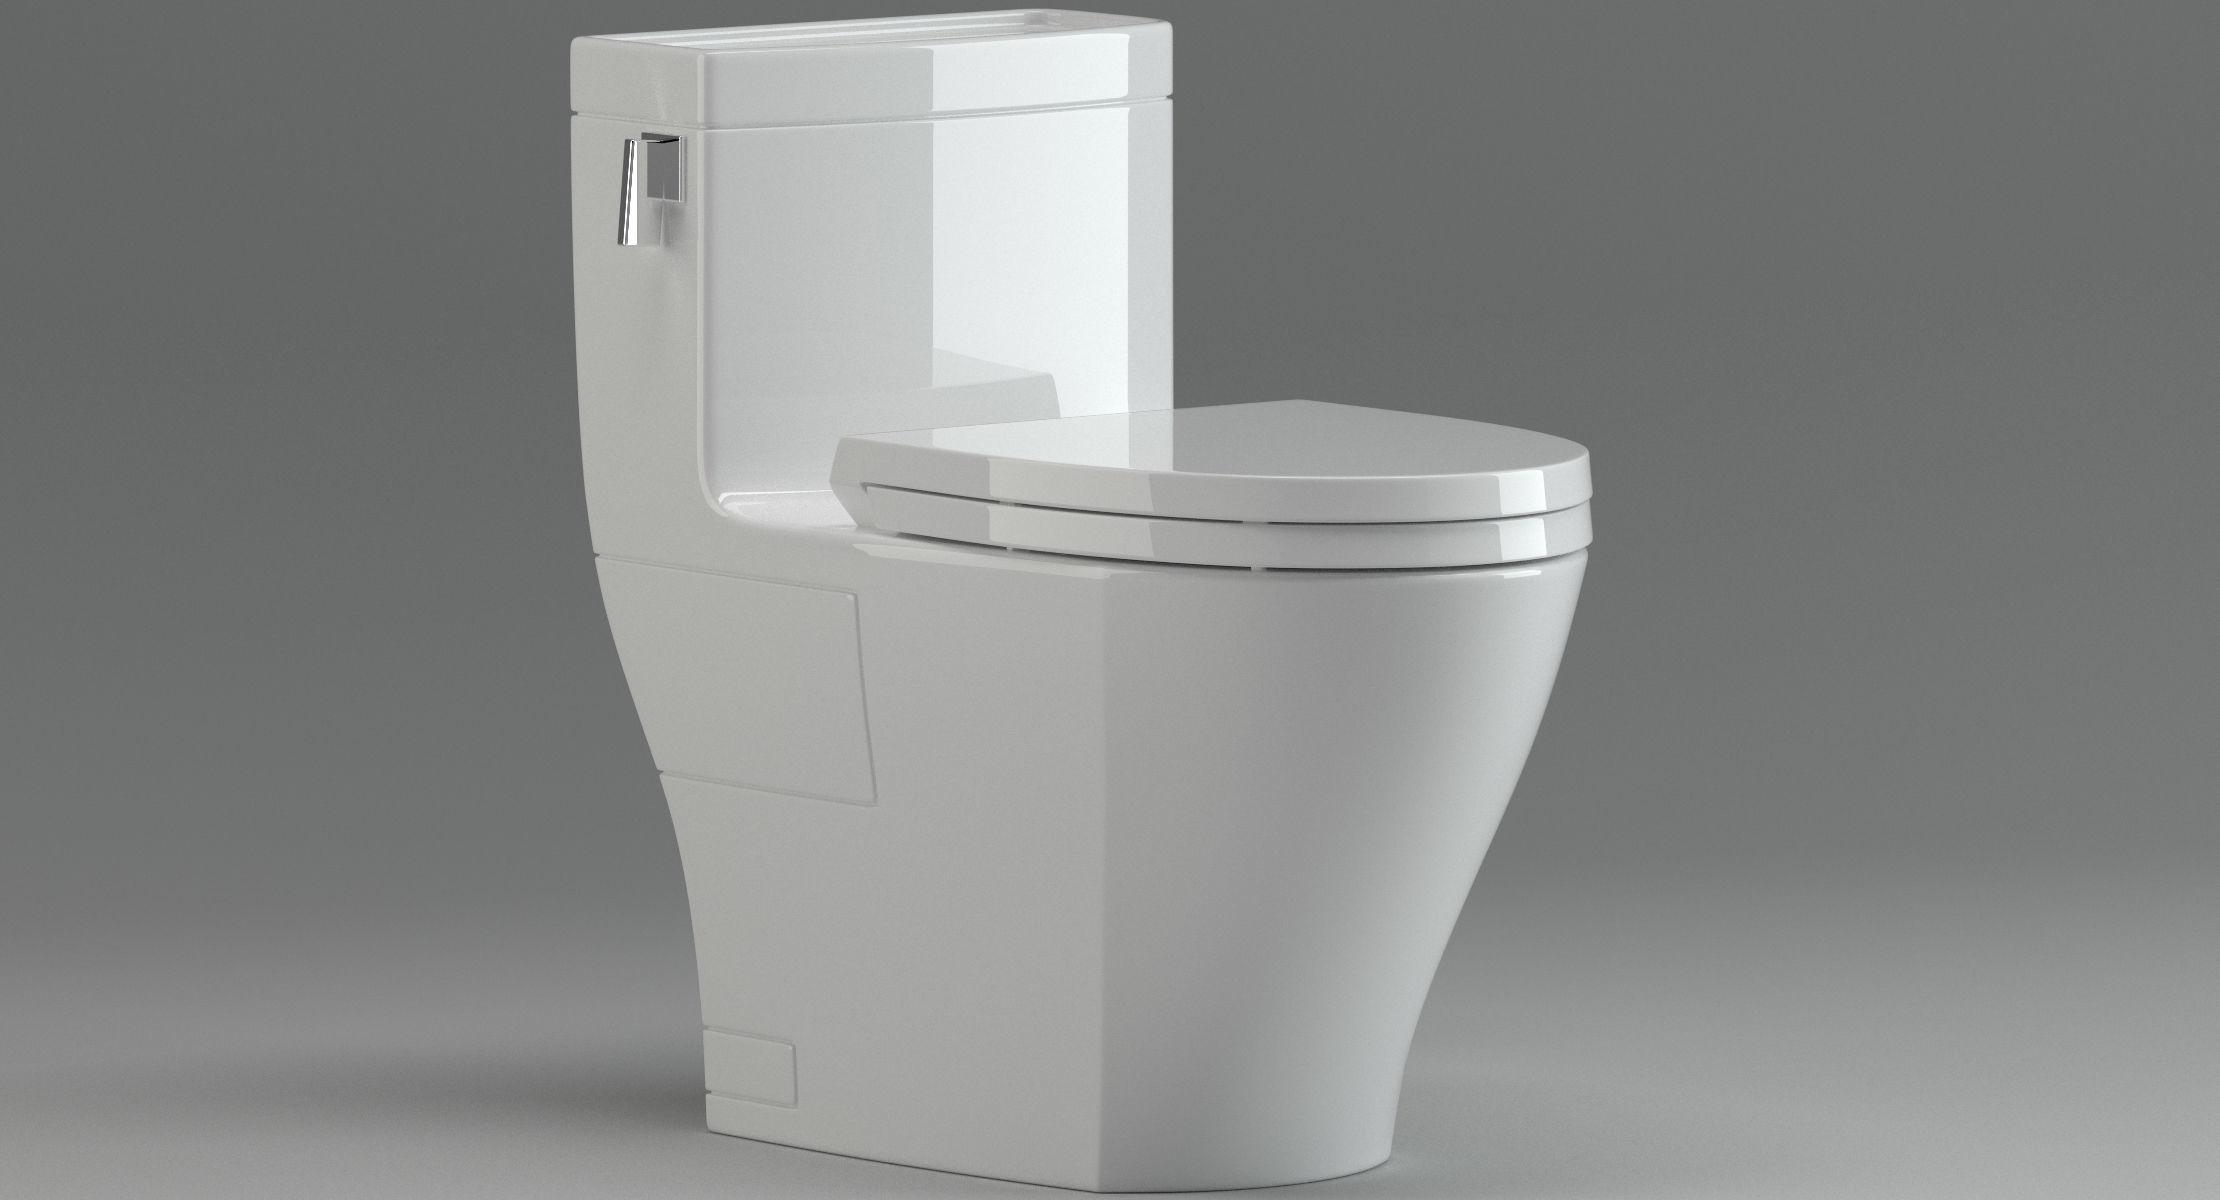 TOTO Legato MS624214CEFG toilet 3D model | CGTrader